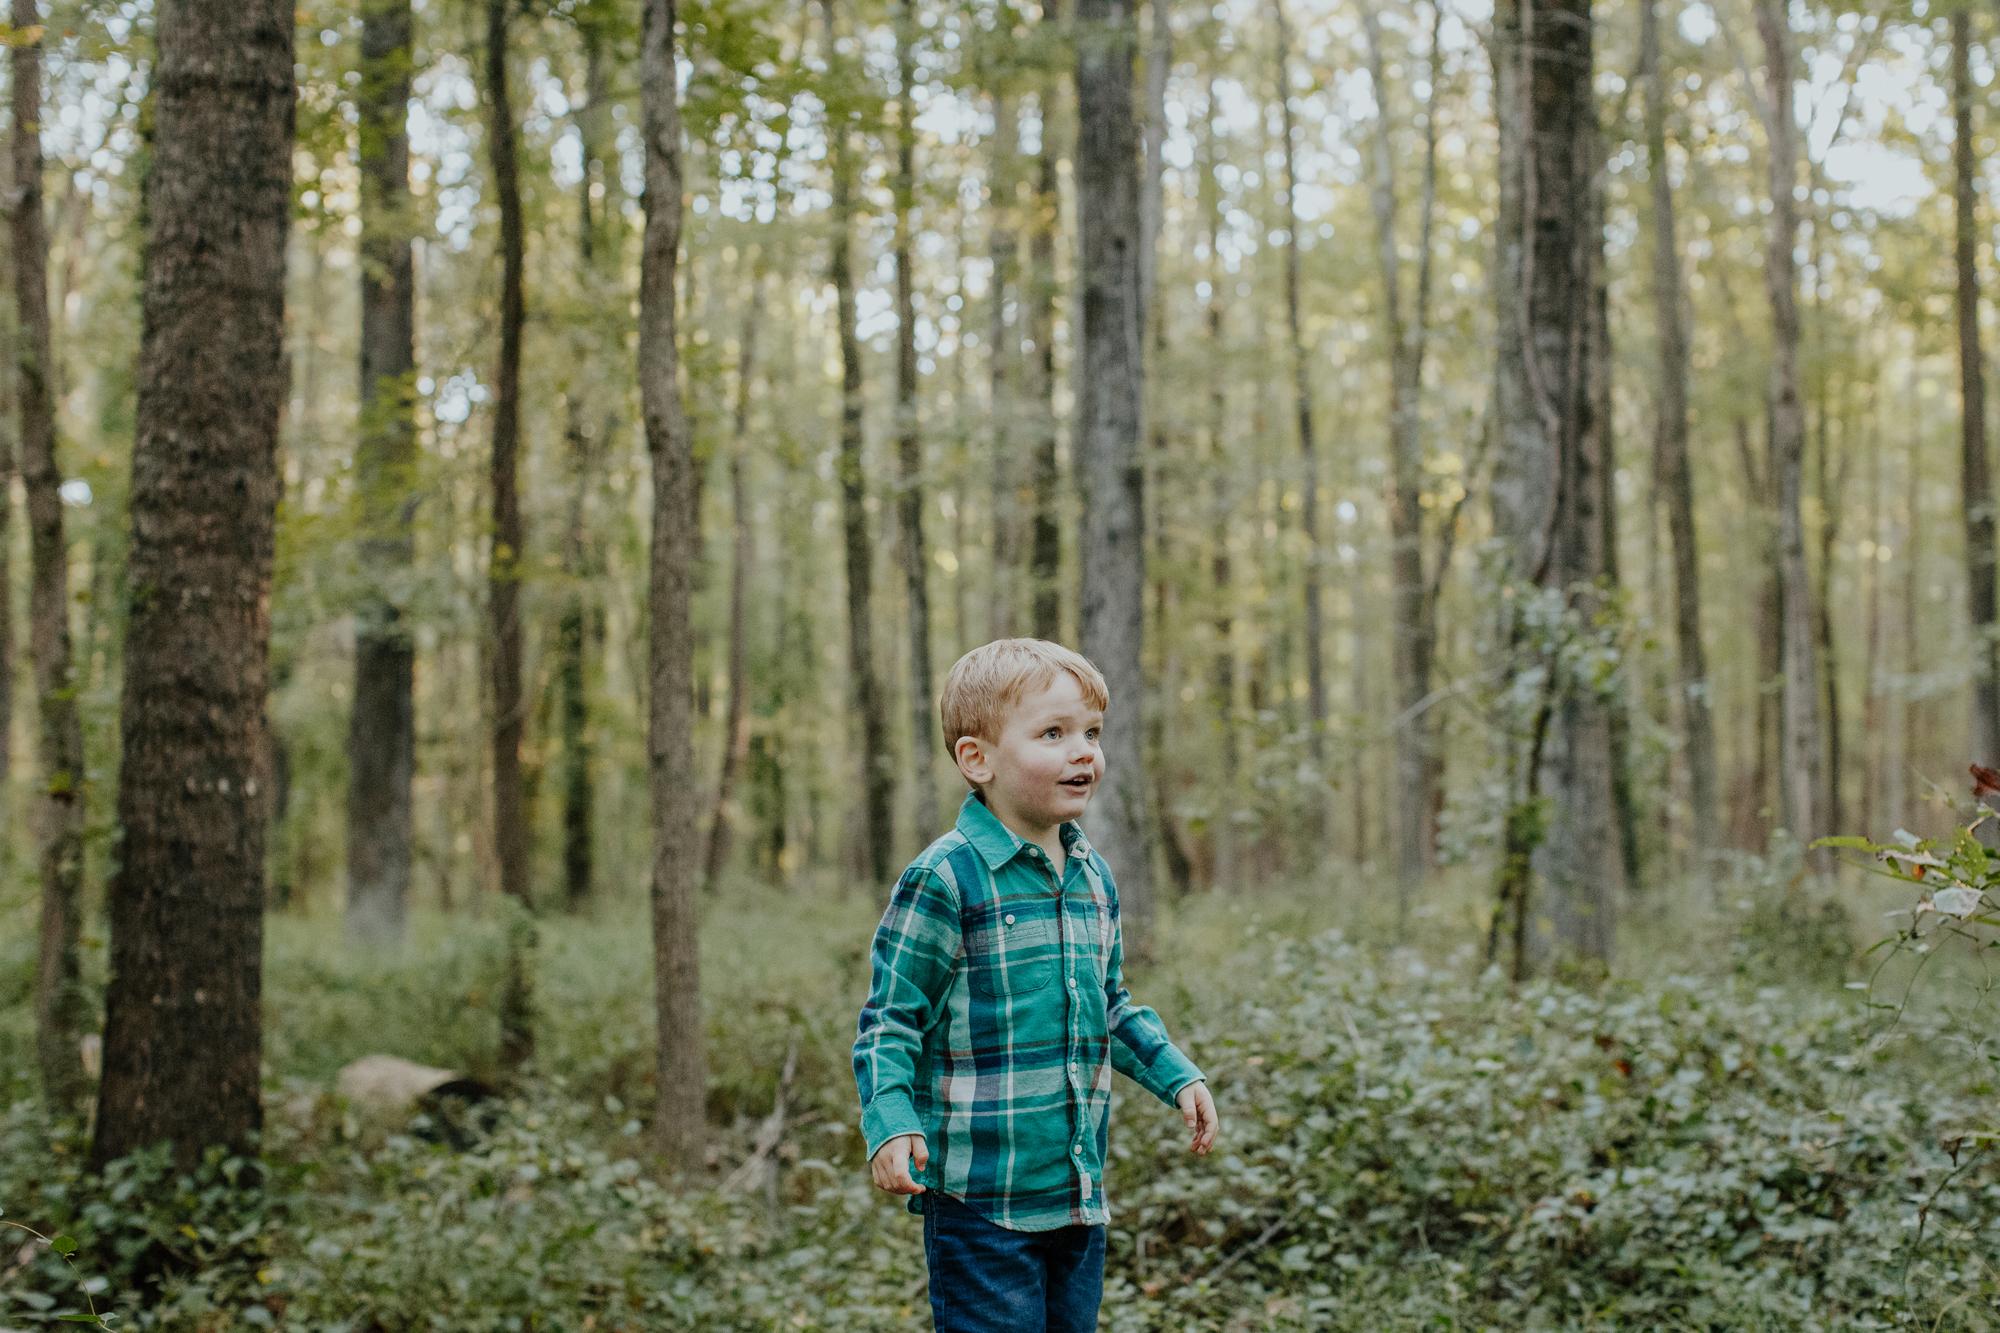 002-huntley_meadows_family_photography.jpg